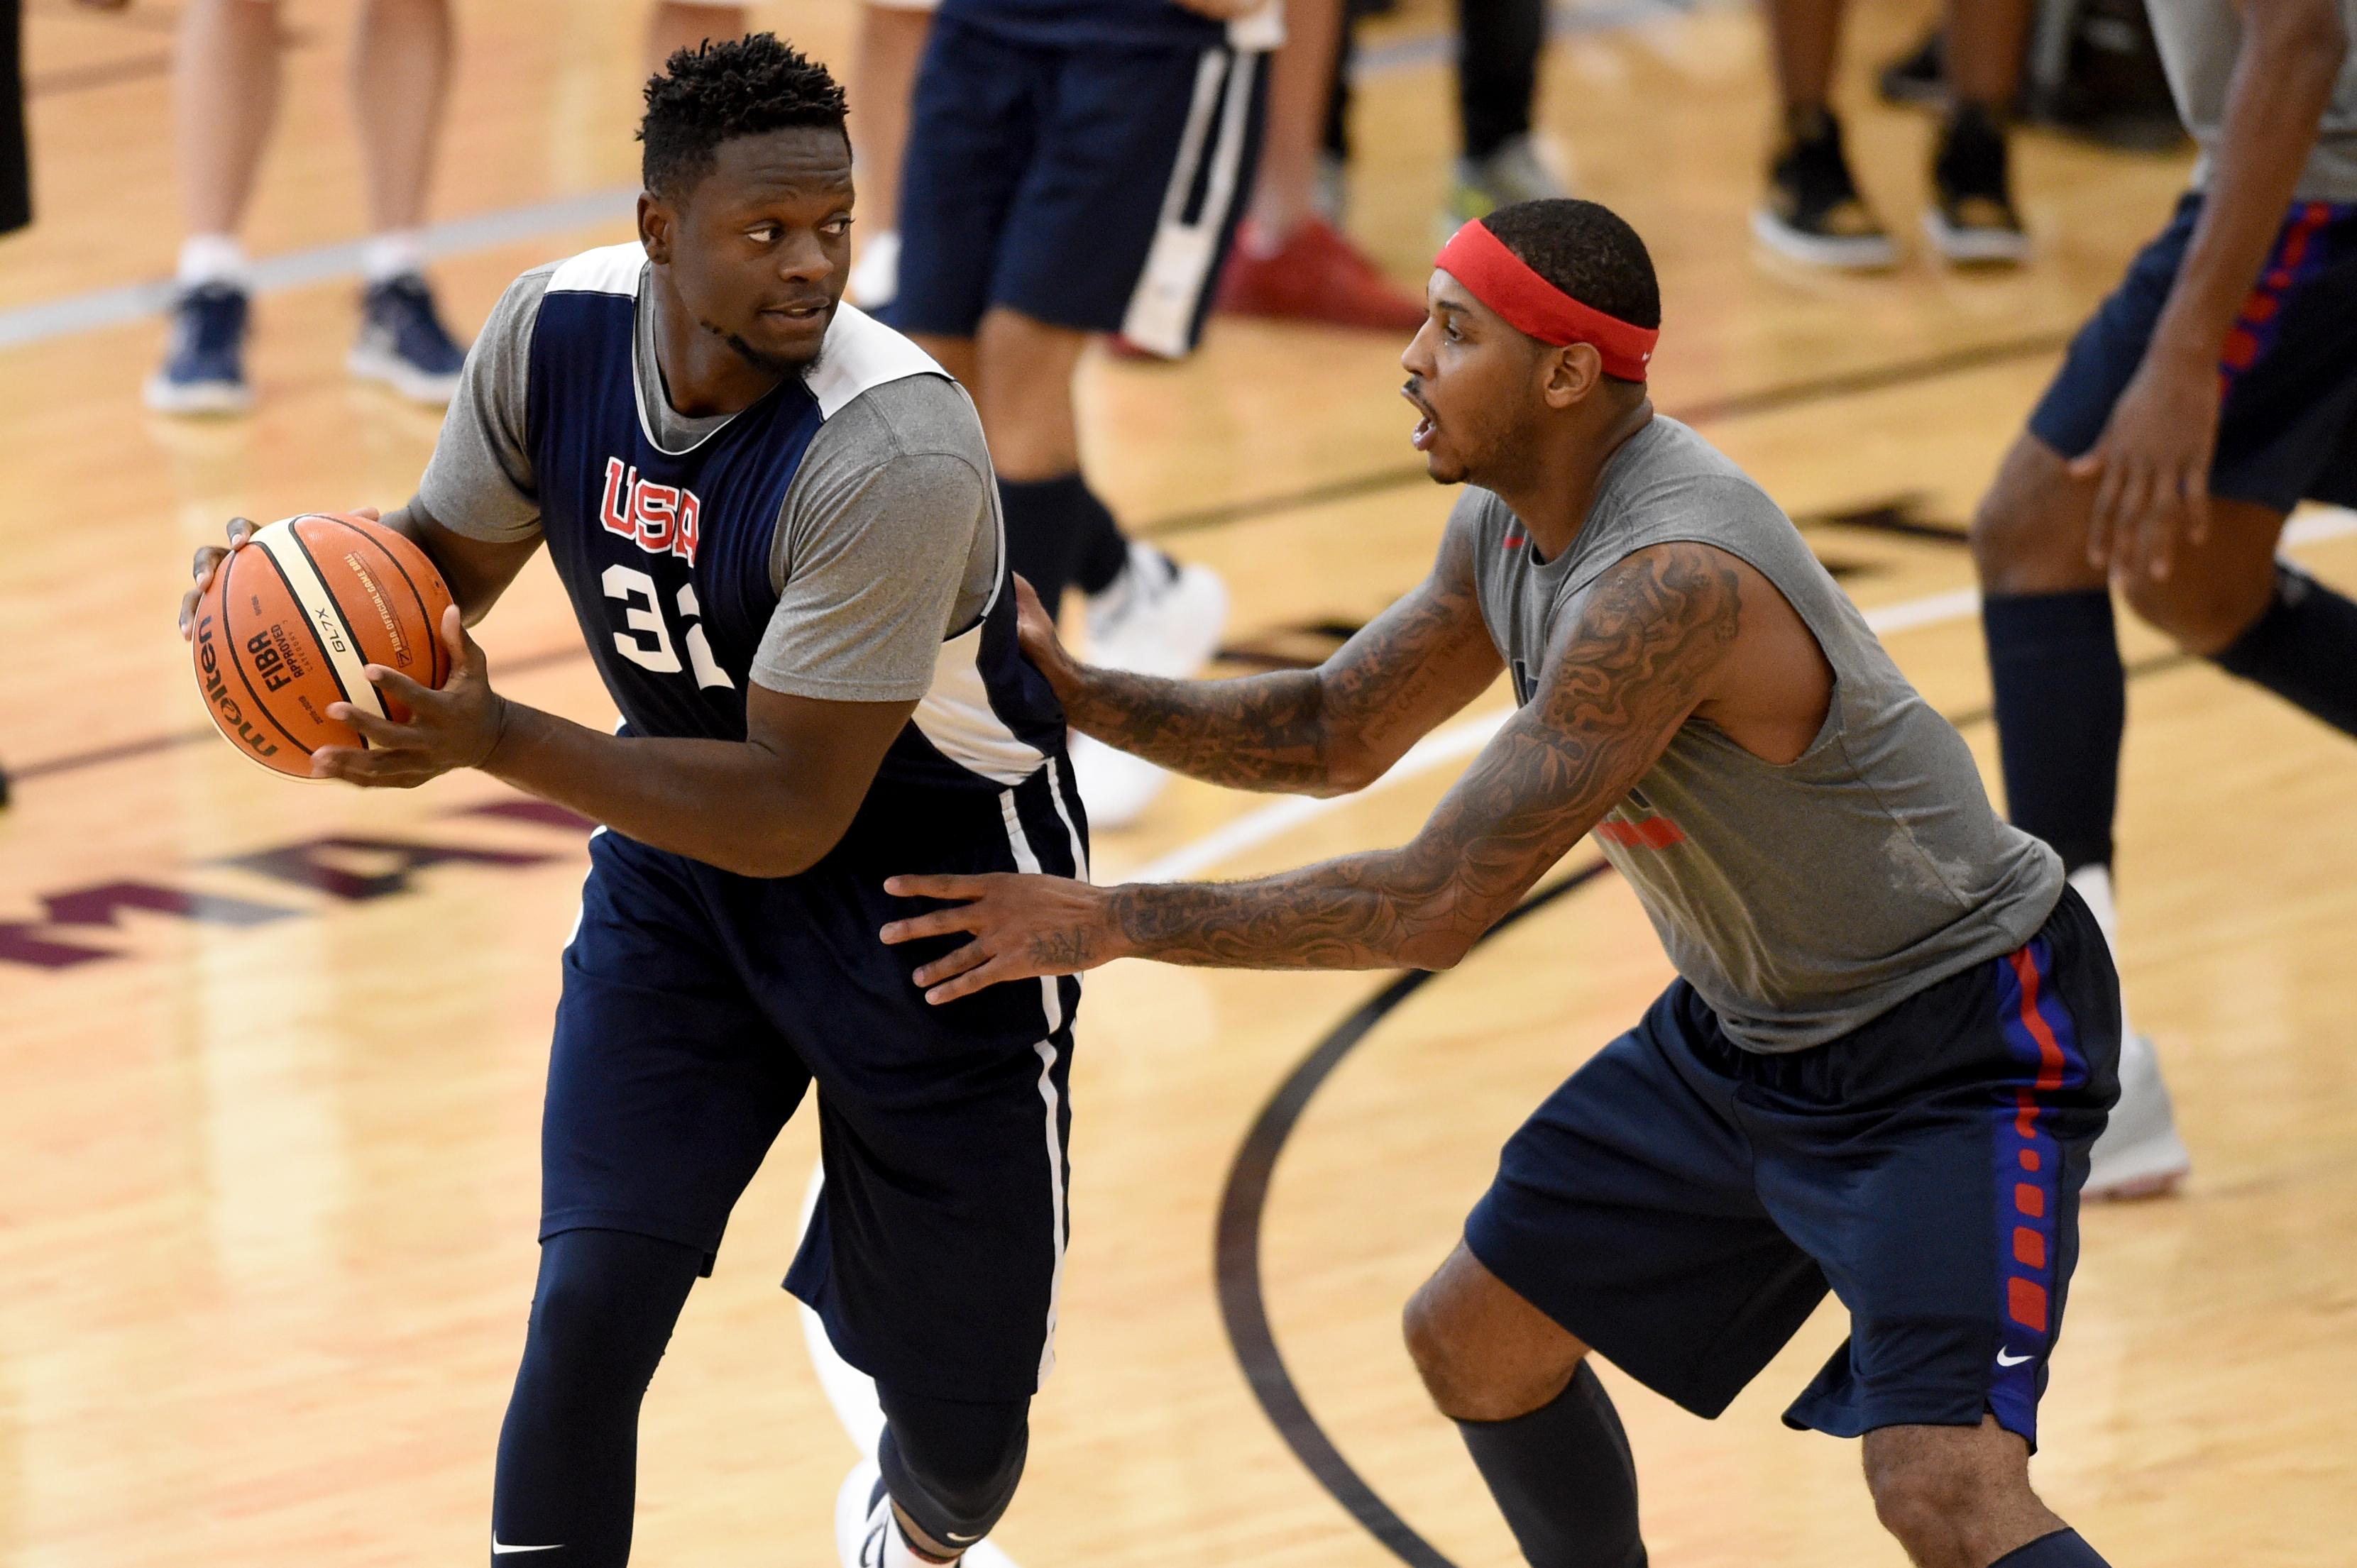 USA Basketball Men's Select Team Practice